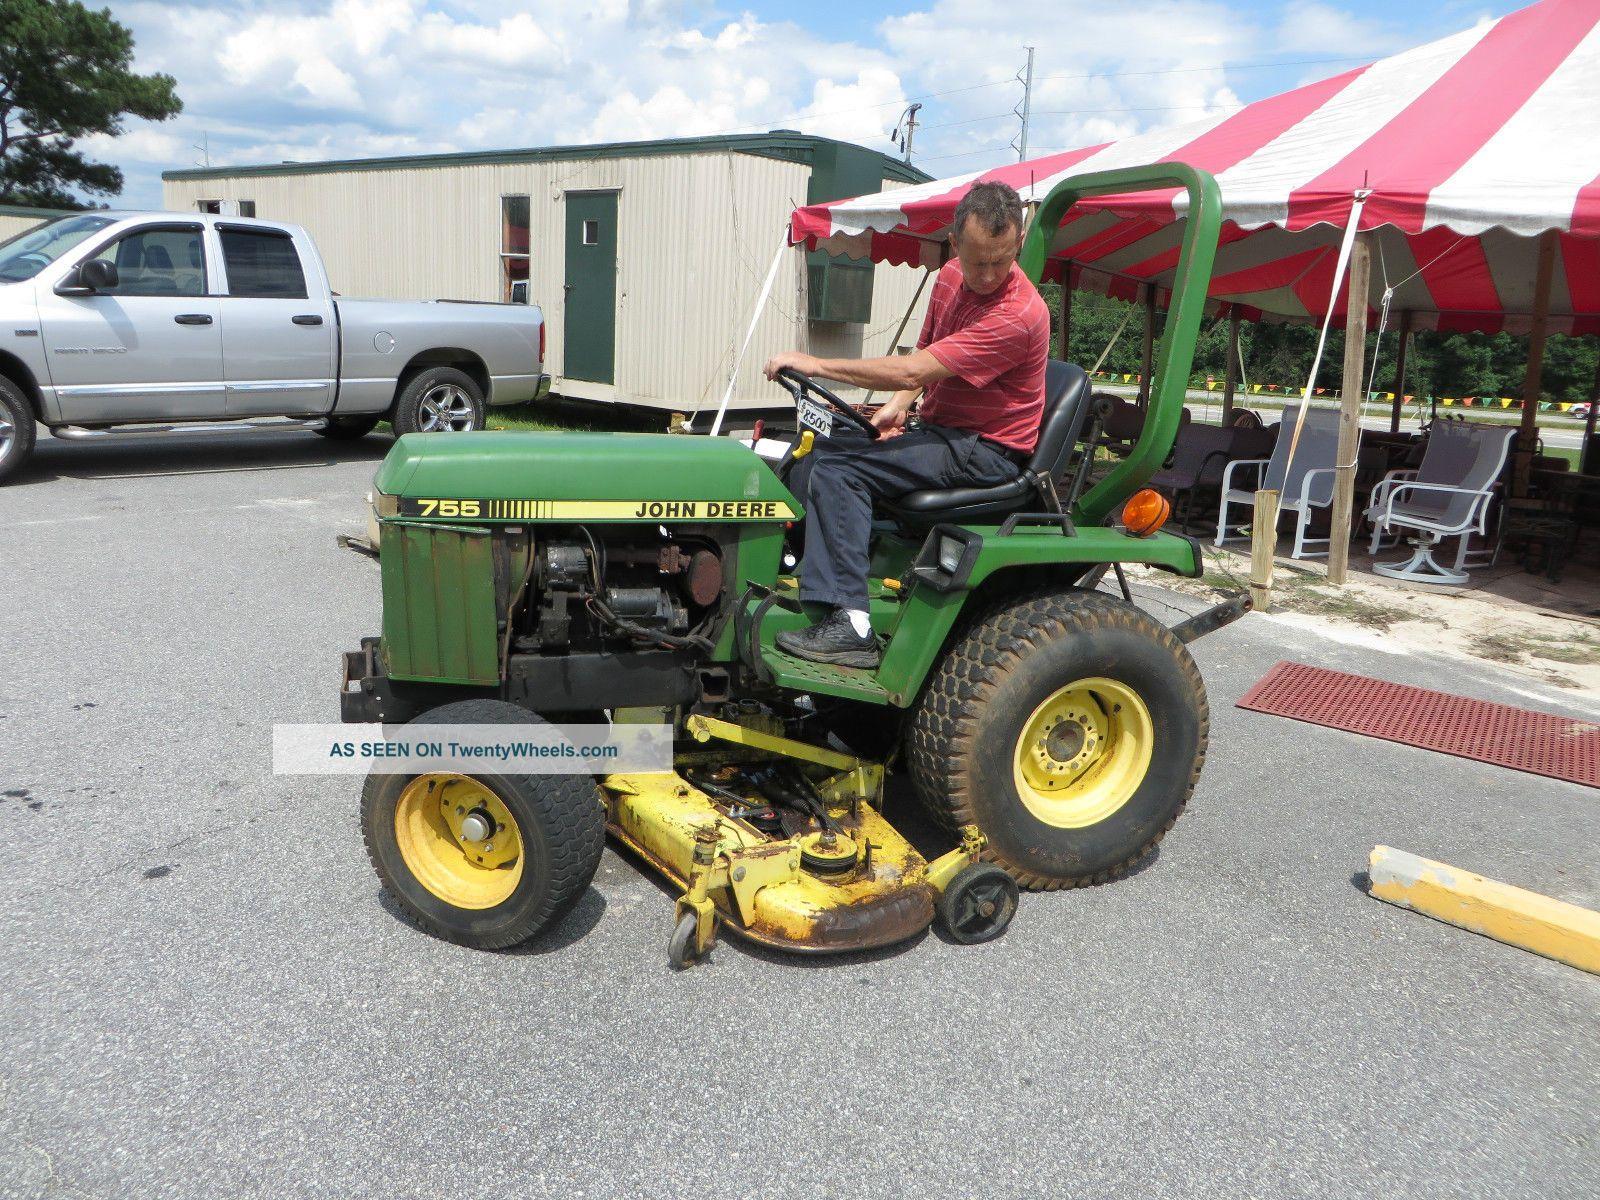 John Deere Compact Utility Tractor Diesel W Belly Mower Lgw